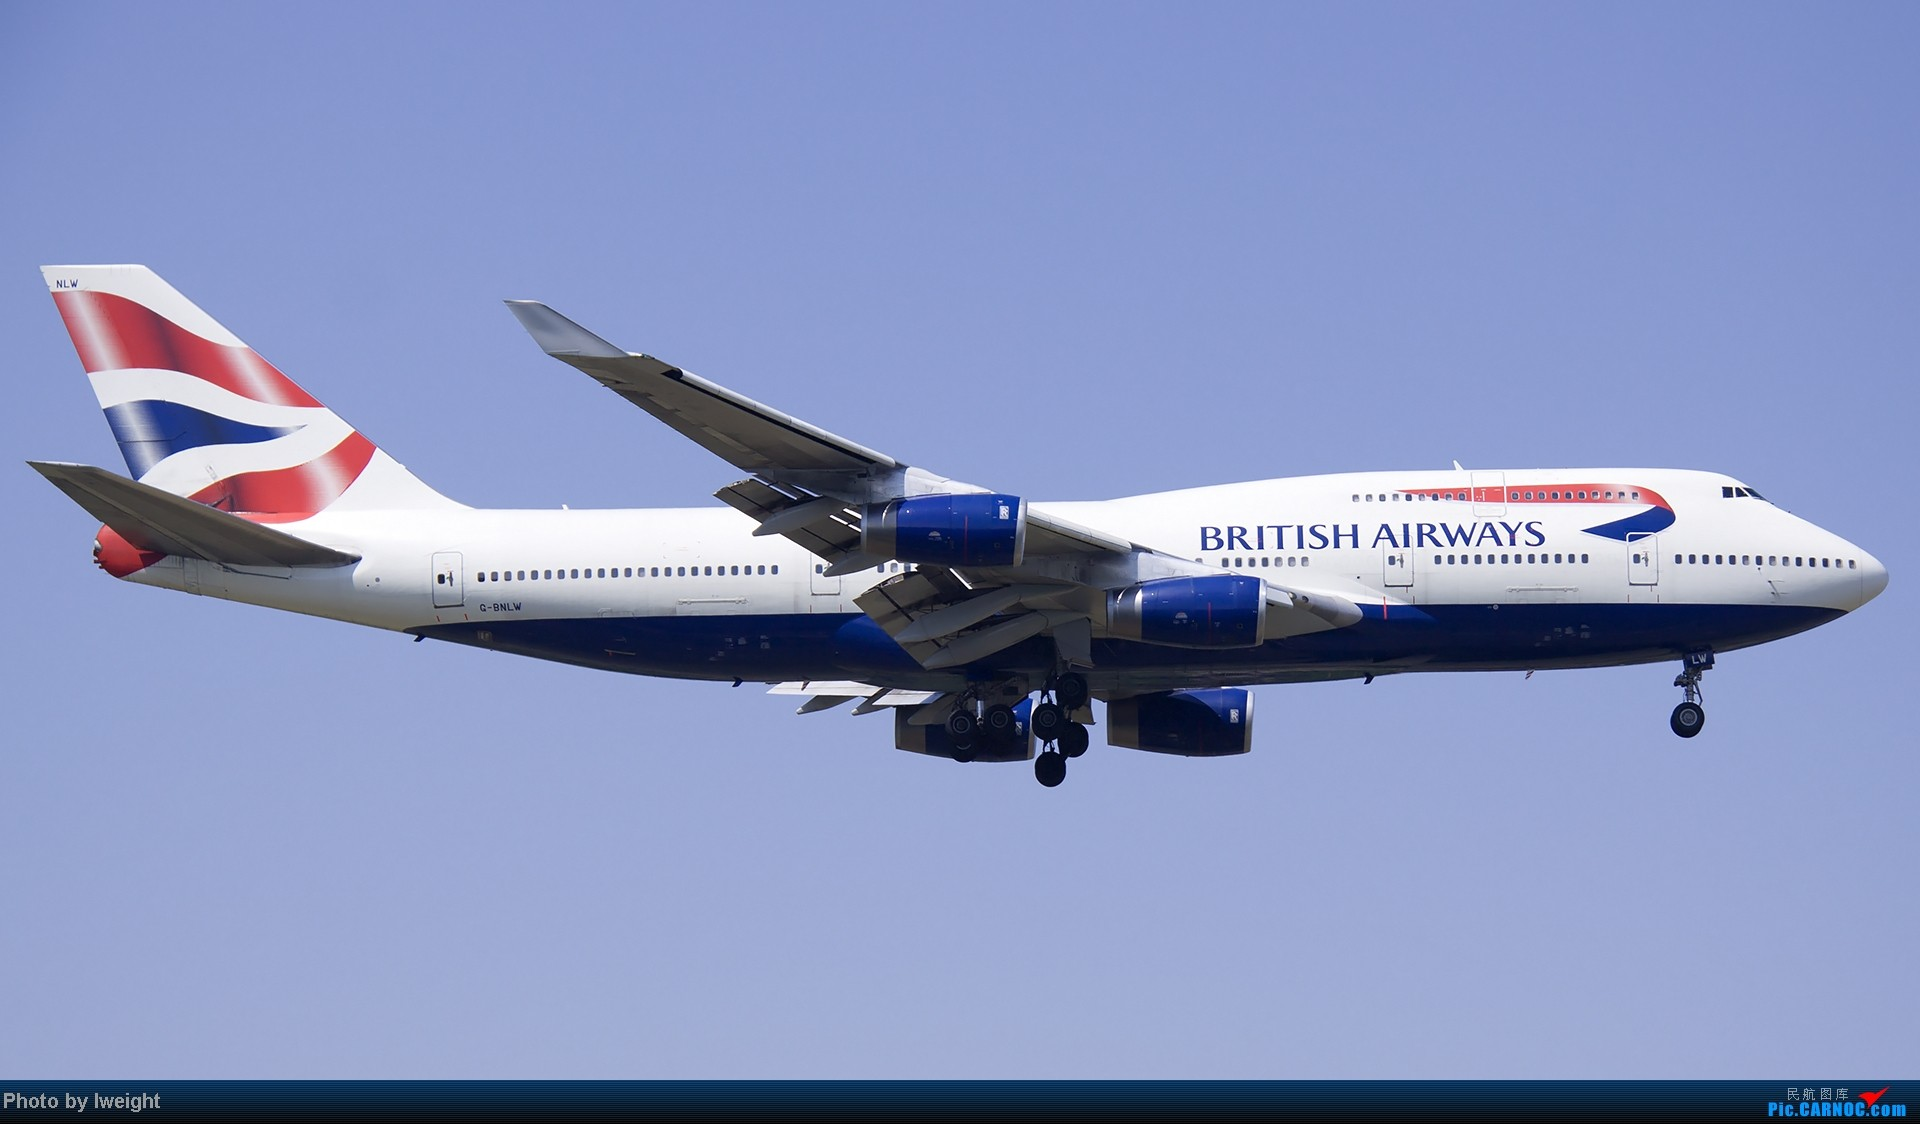 Re:[原创]北京难得的好天气,收获多种机型和彩绘,遗憾的是再次错过卡航巴塞罗那彩绘 BOEING 747-400 G-BNLW 中国北京首都机场